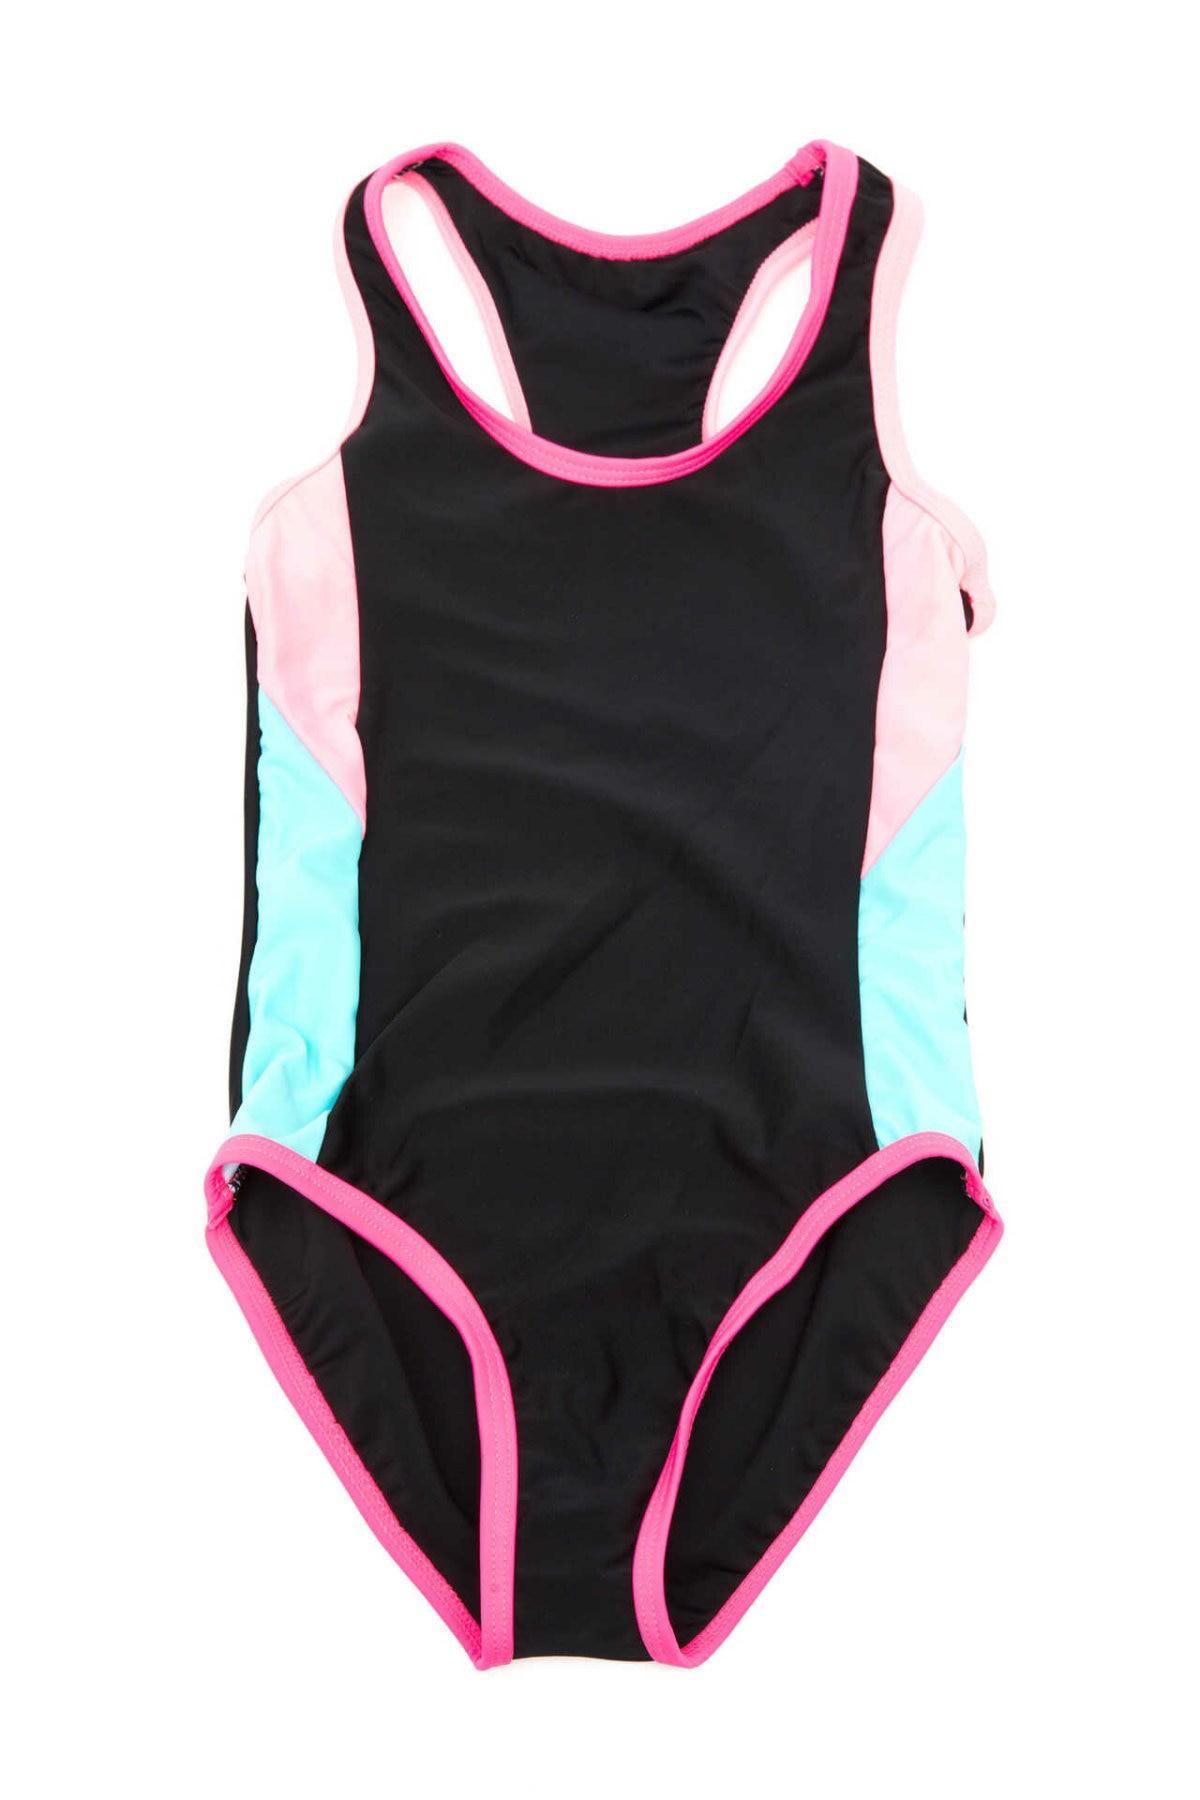 DeFacto Girl Woven Swimsuit Kids One-piece Bikini Casual Comfortable Monkini Casual Summer Black - I3059A618SM